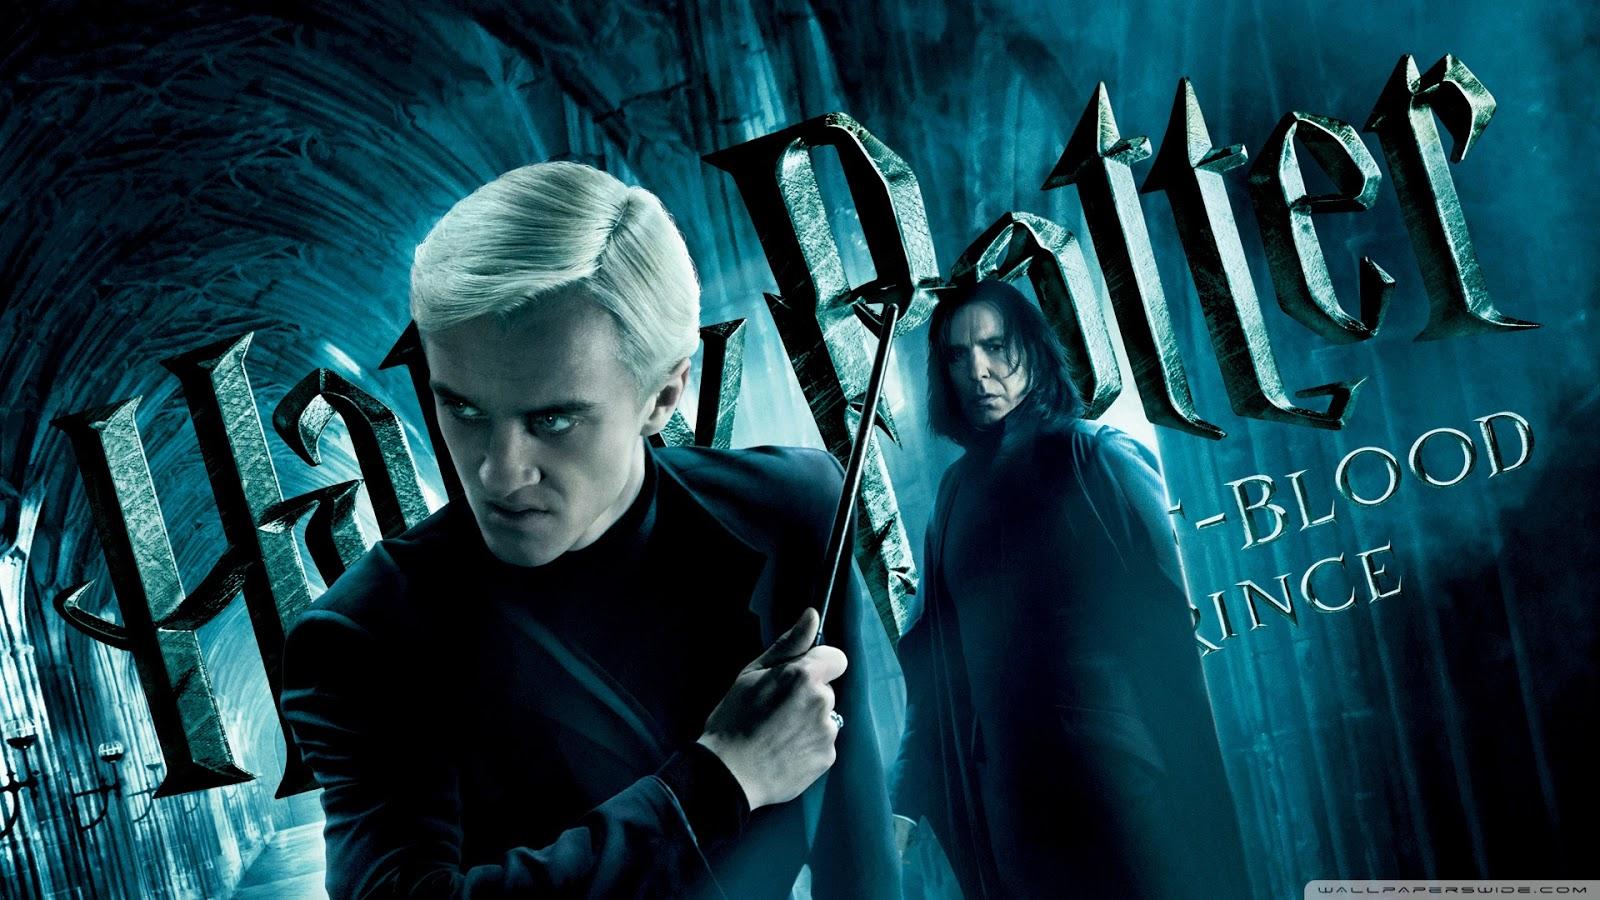 Harry Potter Half Blood Prince Poster HD Still